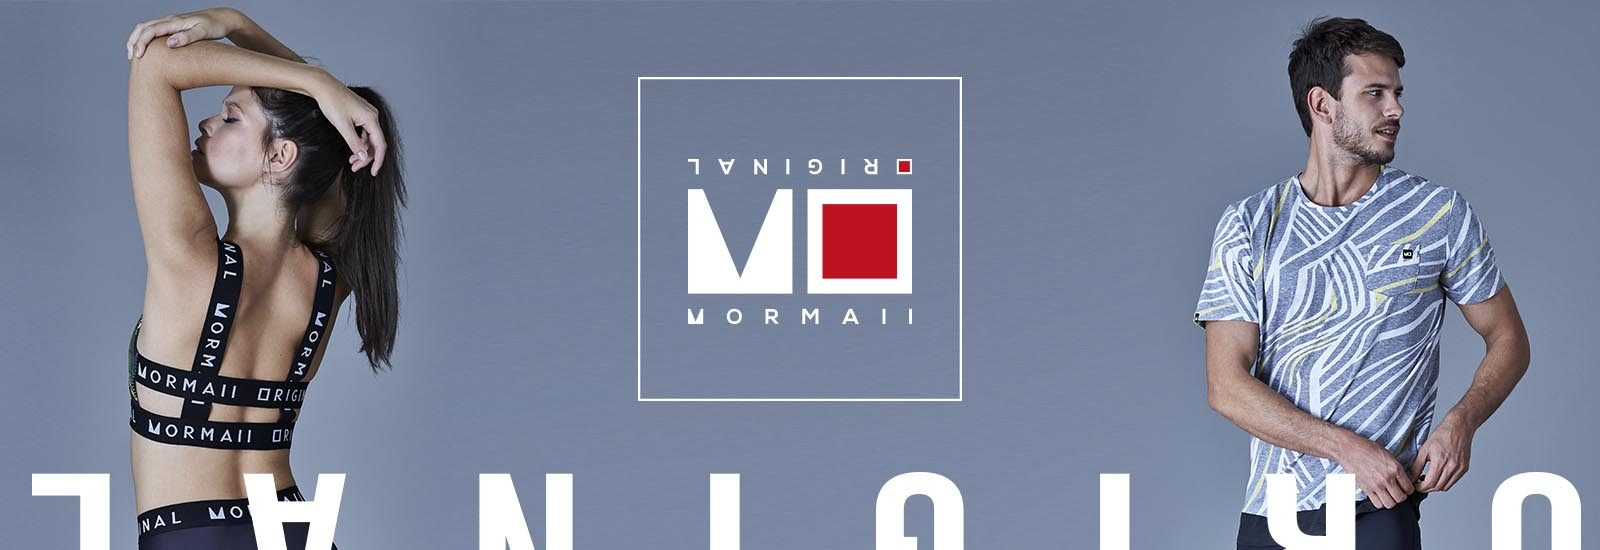 Mormaii Original